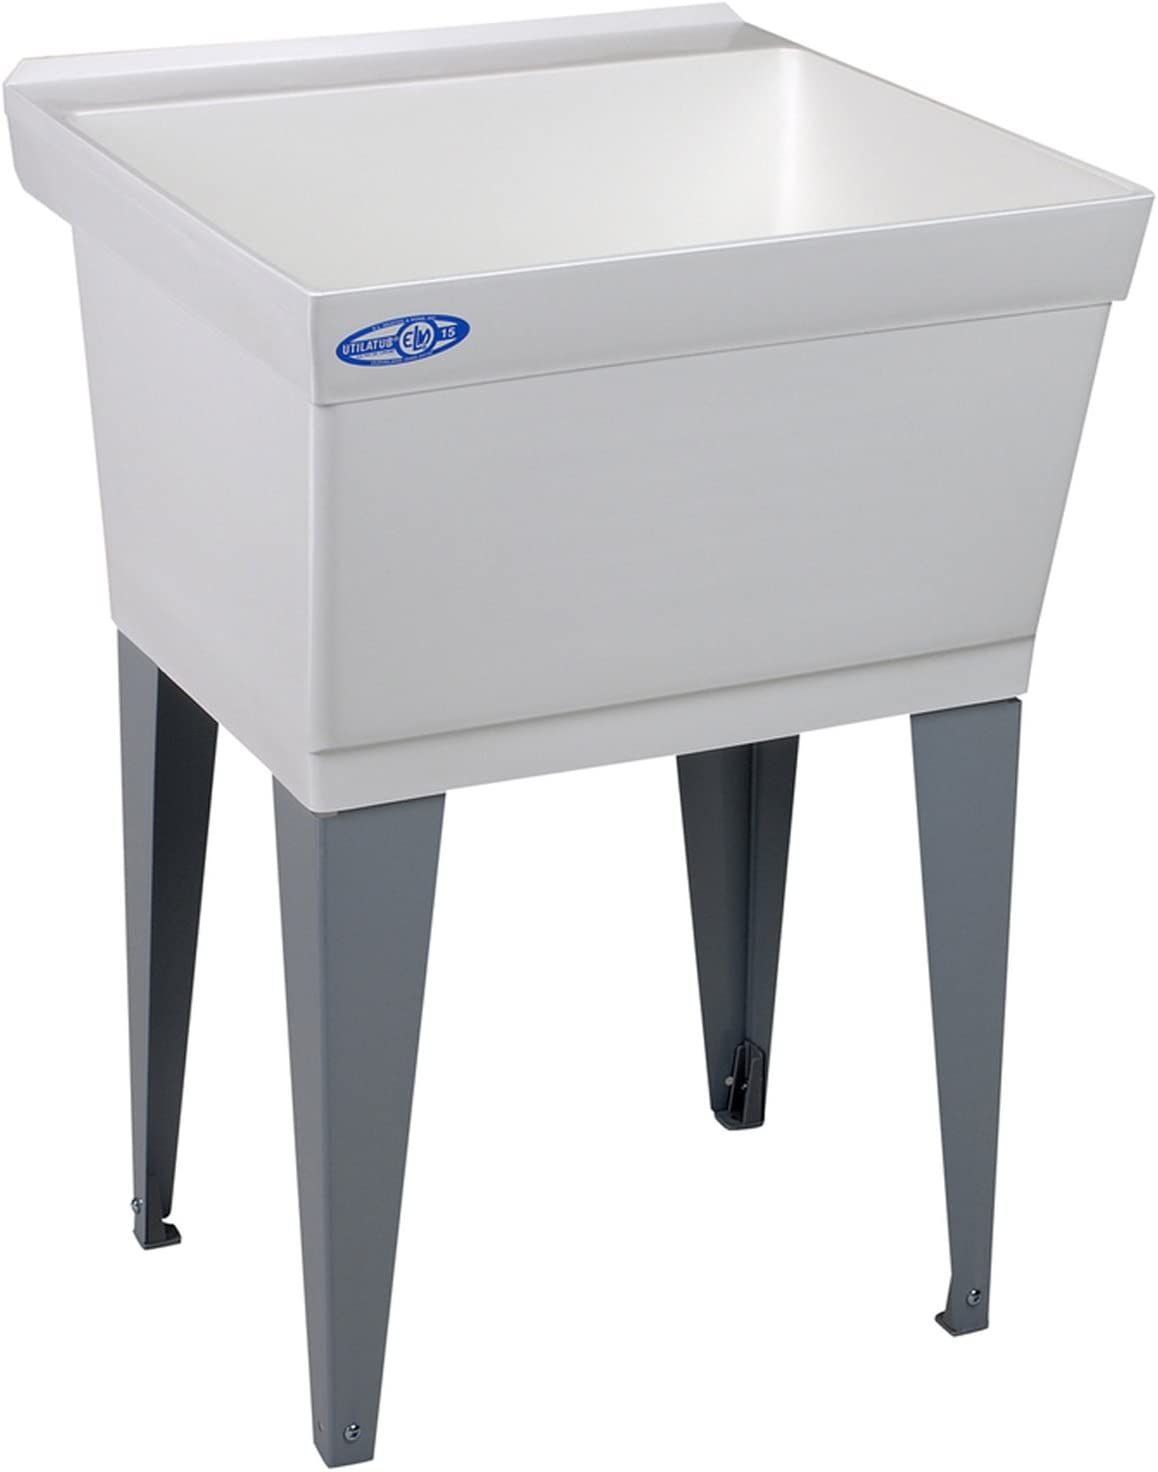 Mustee 15F Utilatub Laundry Tub Floor Mount, 23.5-Inch x 23-Inch, White